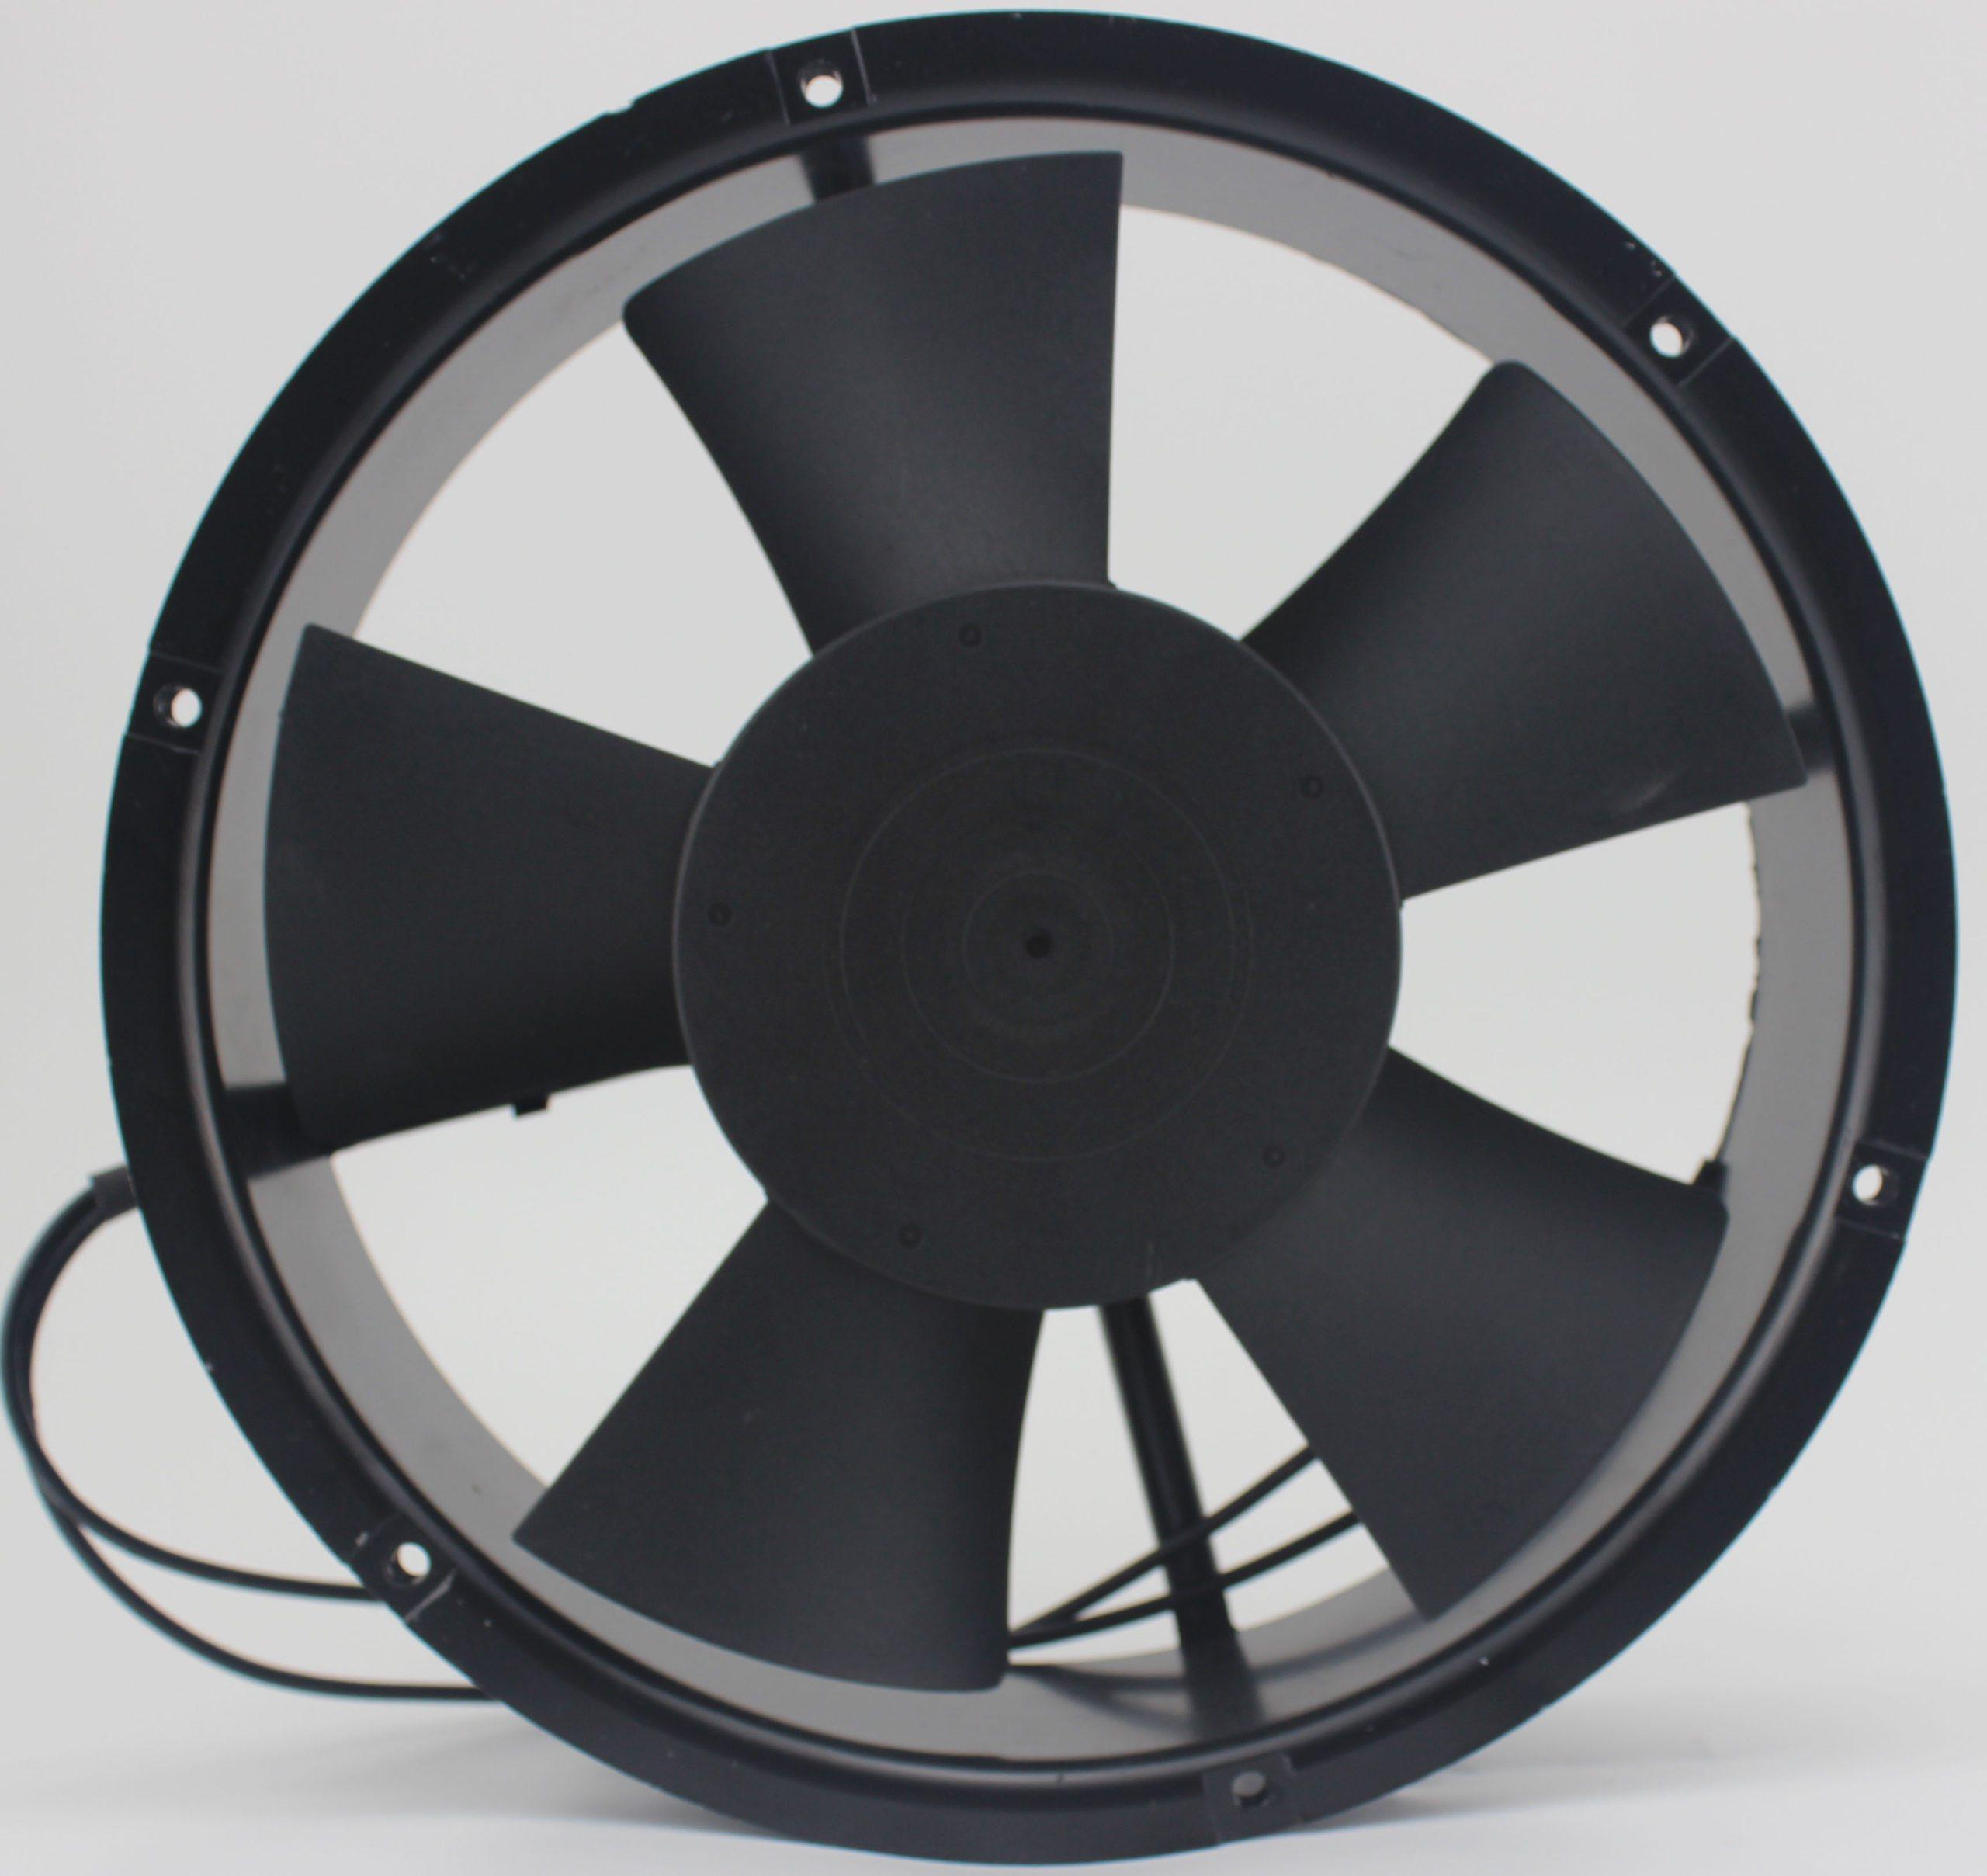 XFAN RAH2260B1-C 220-240VAC 0.25/0.26A cooling fan